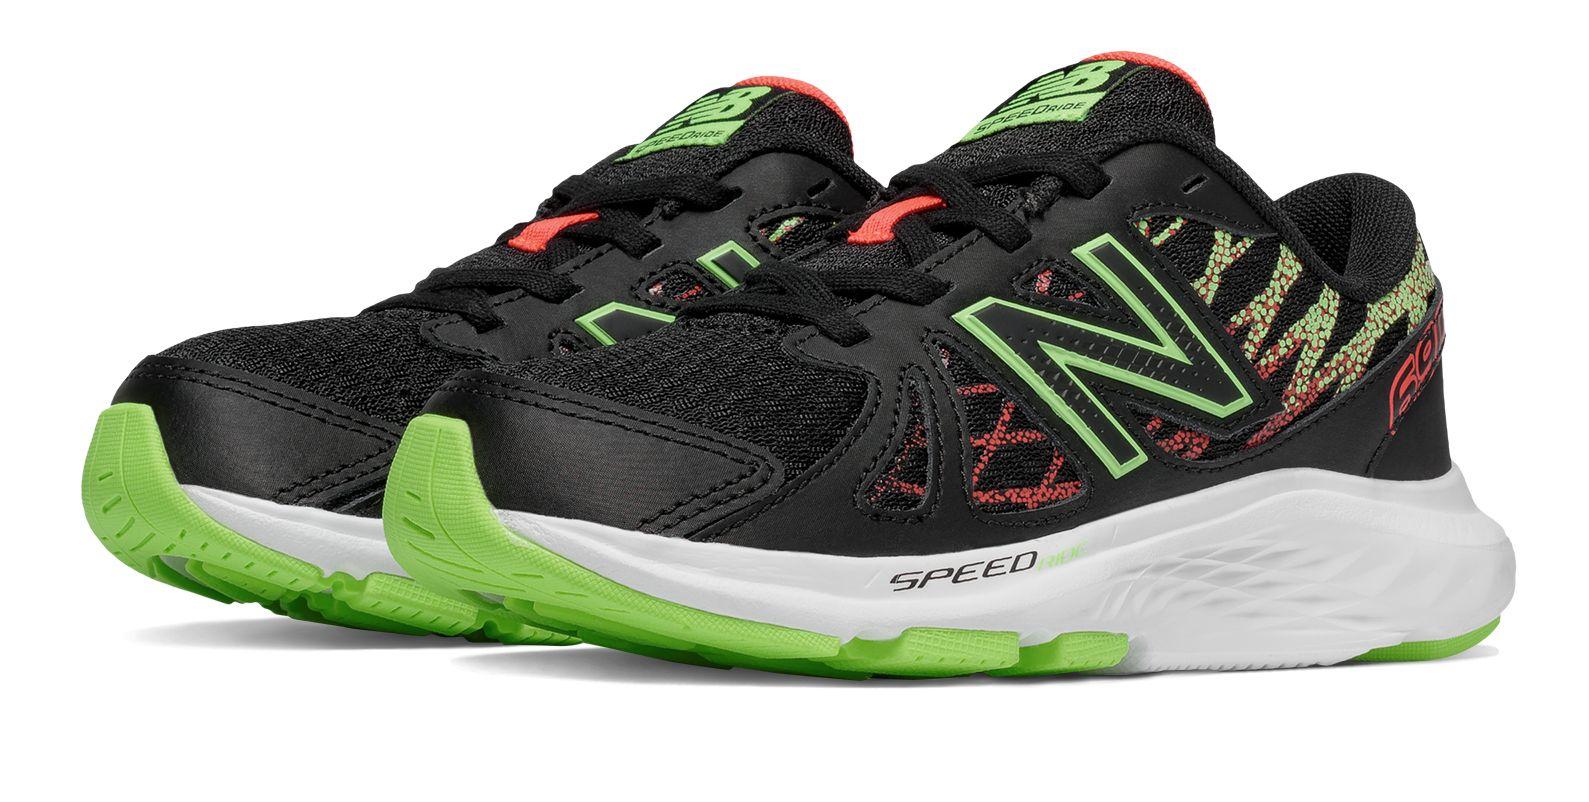 New Balance Auto Racing Shoes